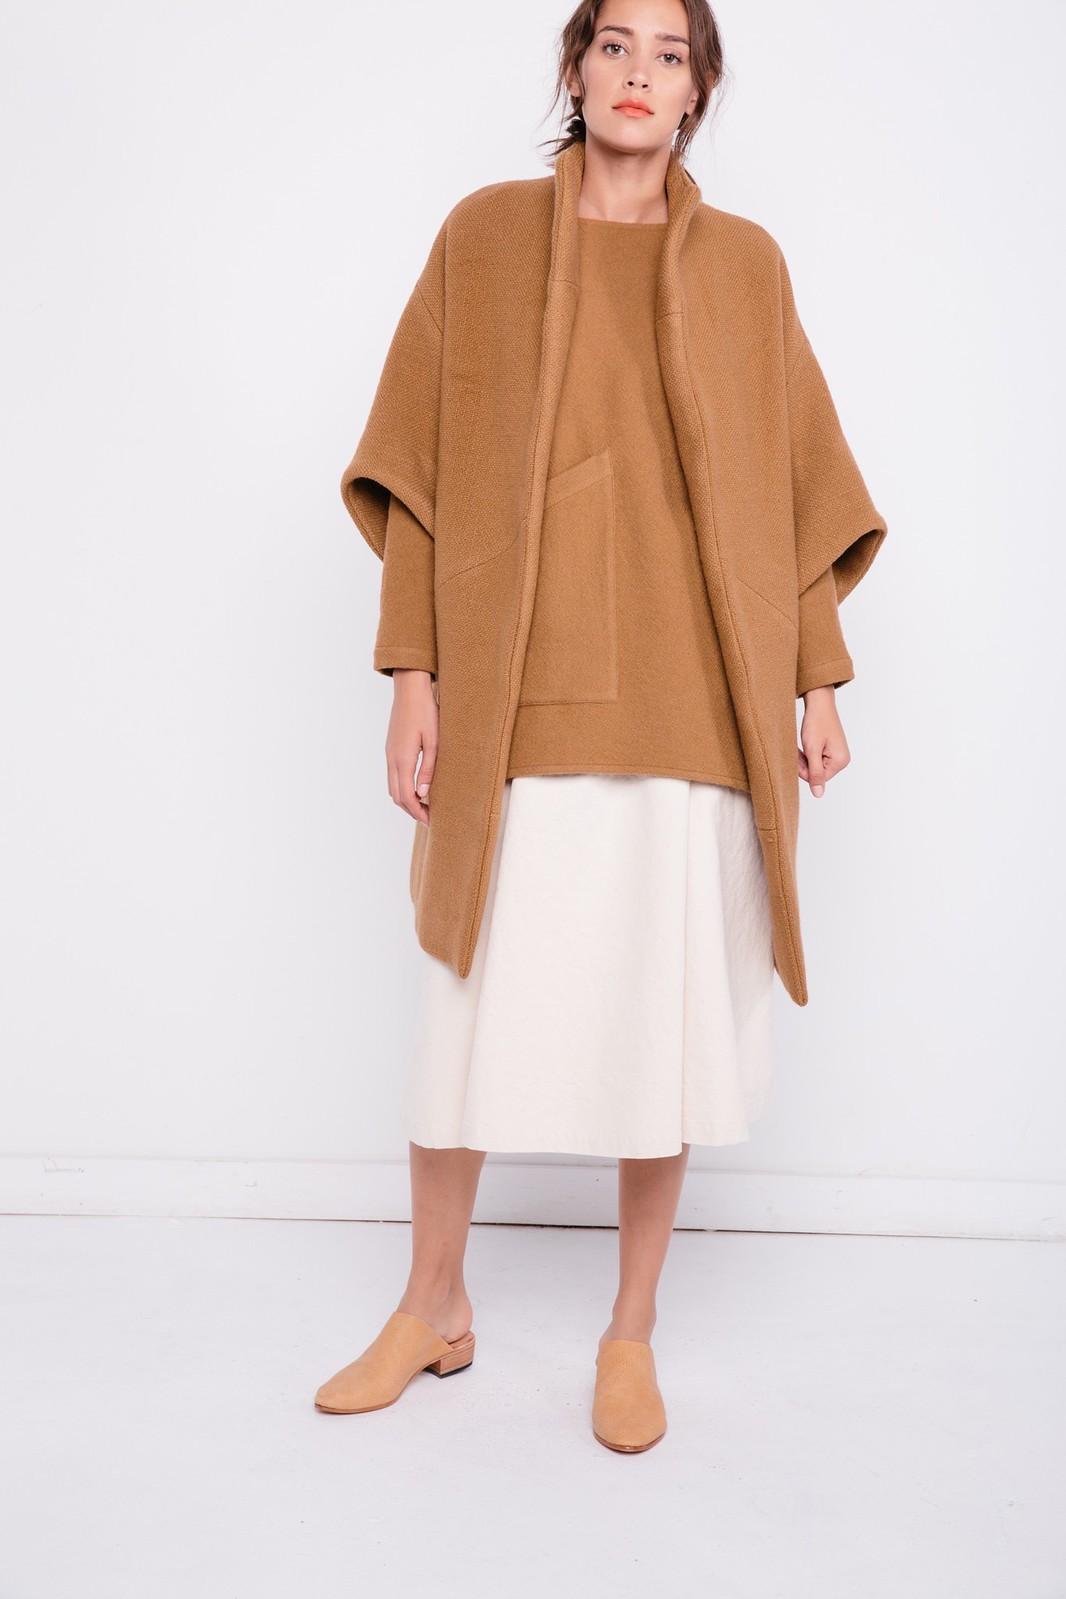 04-elizabeth-suzann-product-harper-tunic-camel-felted-wool